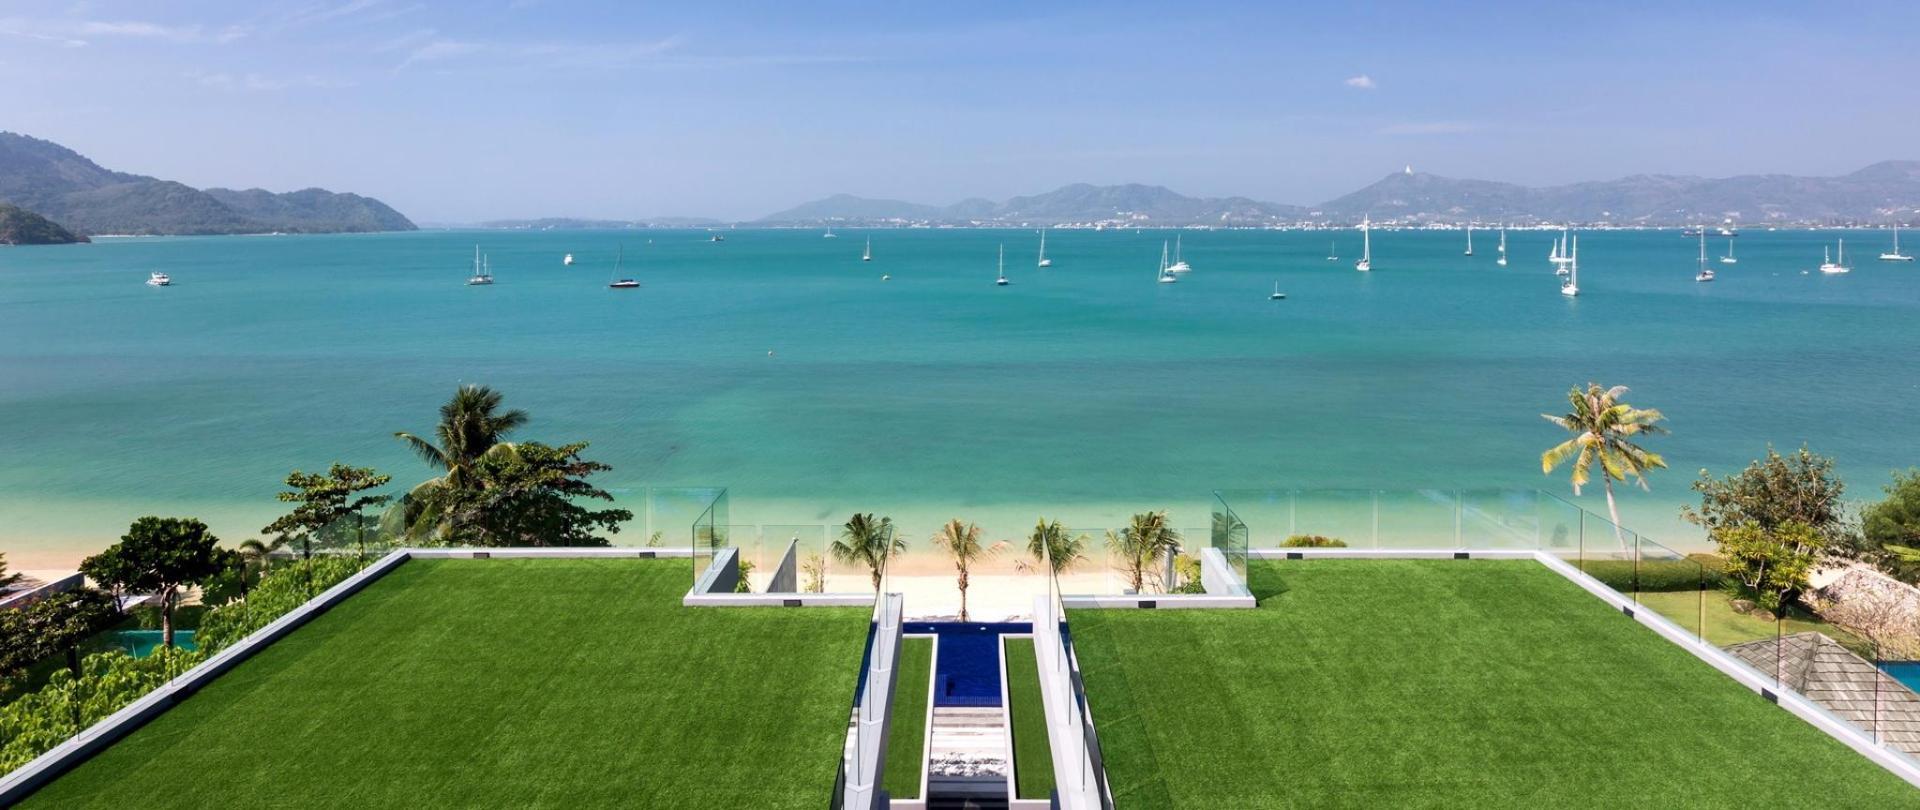 Апартаменты X10 Seaview Suites на пляже Панва